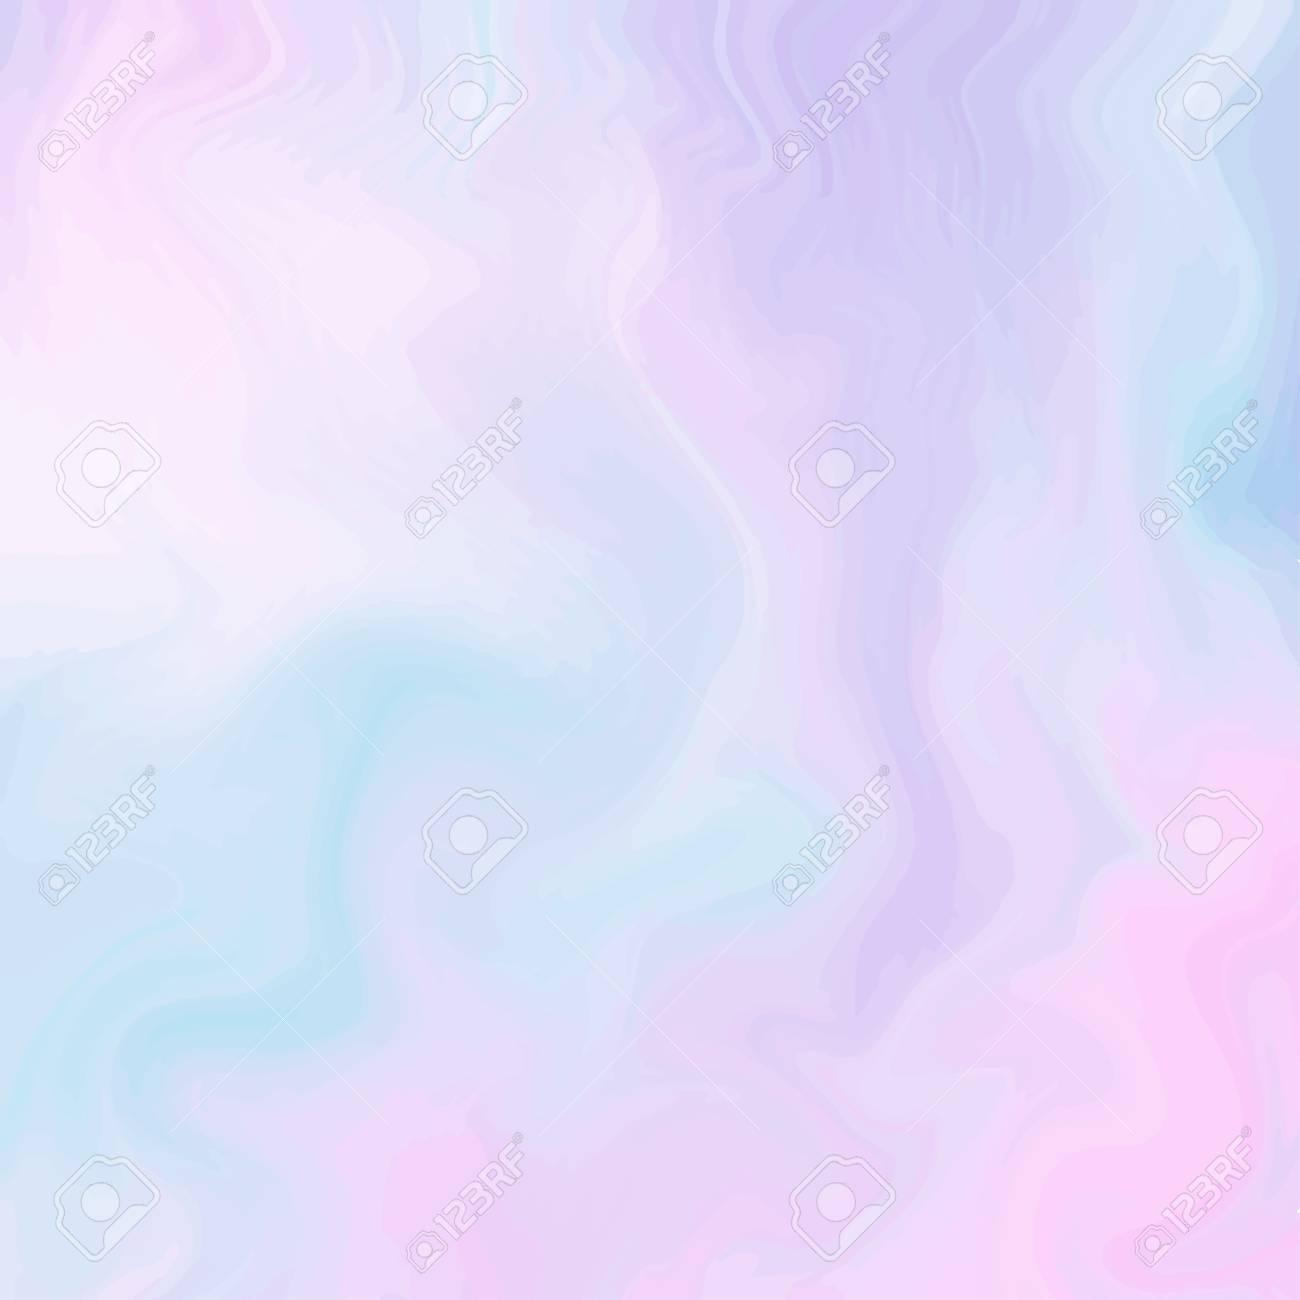 Magic Fairy and Unicorn background with light pastel rainbow